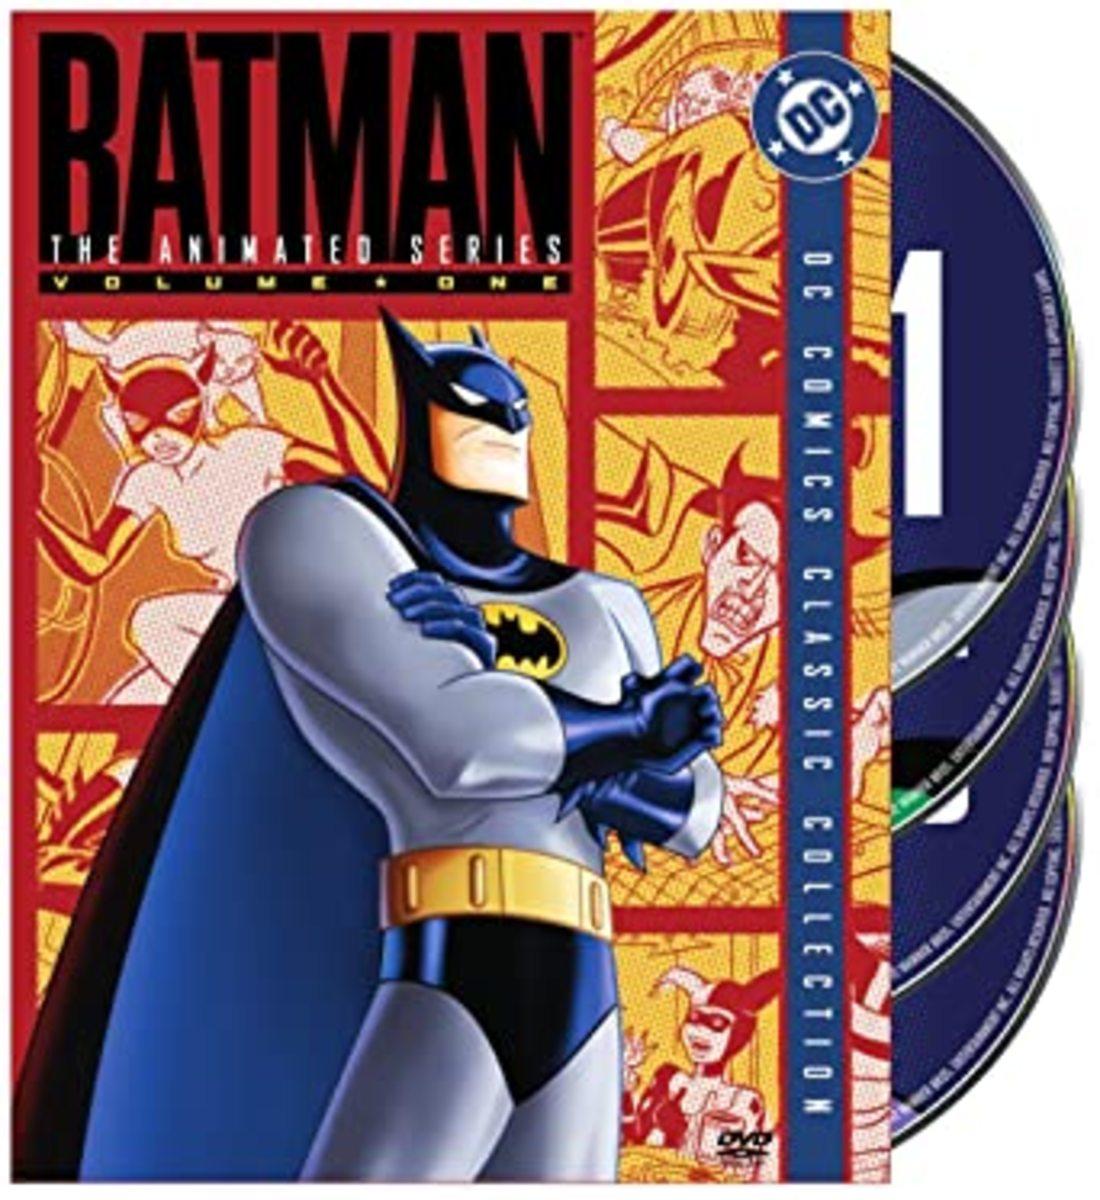 """Batman: The Animated Series"" Season 1 DVD cover art."